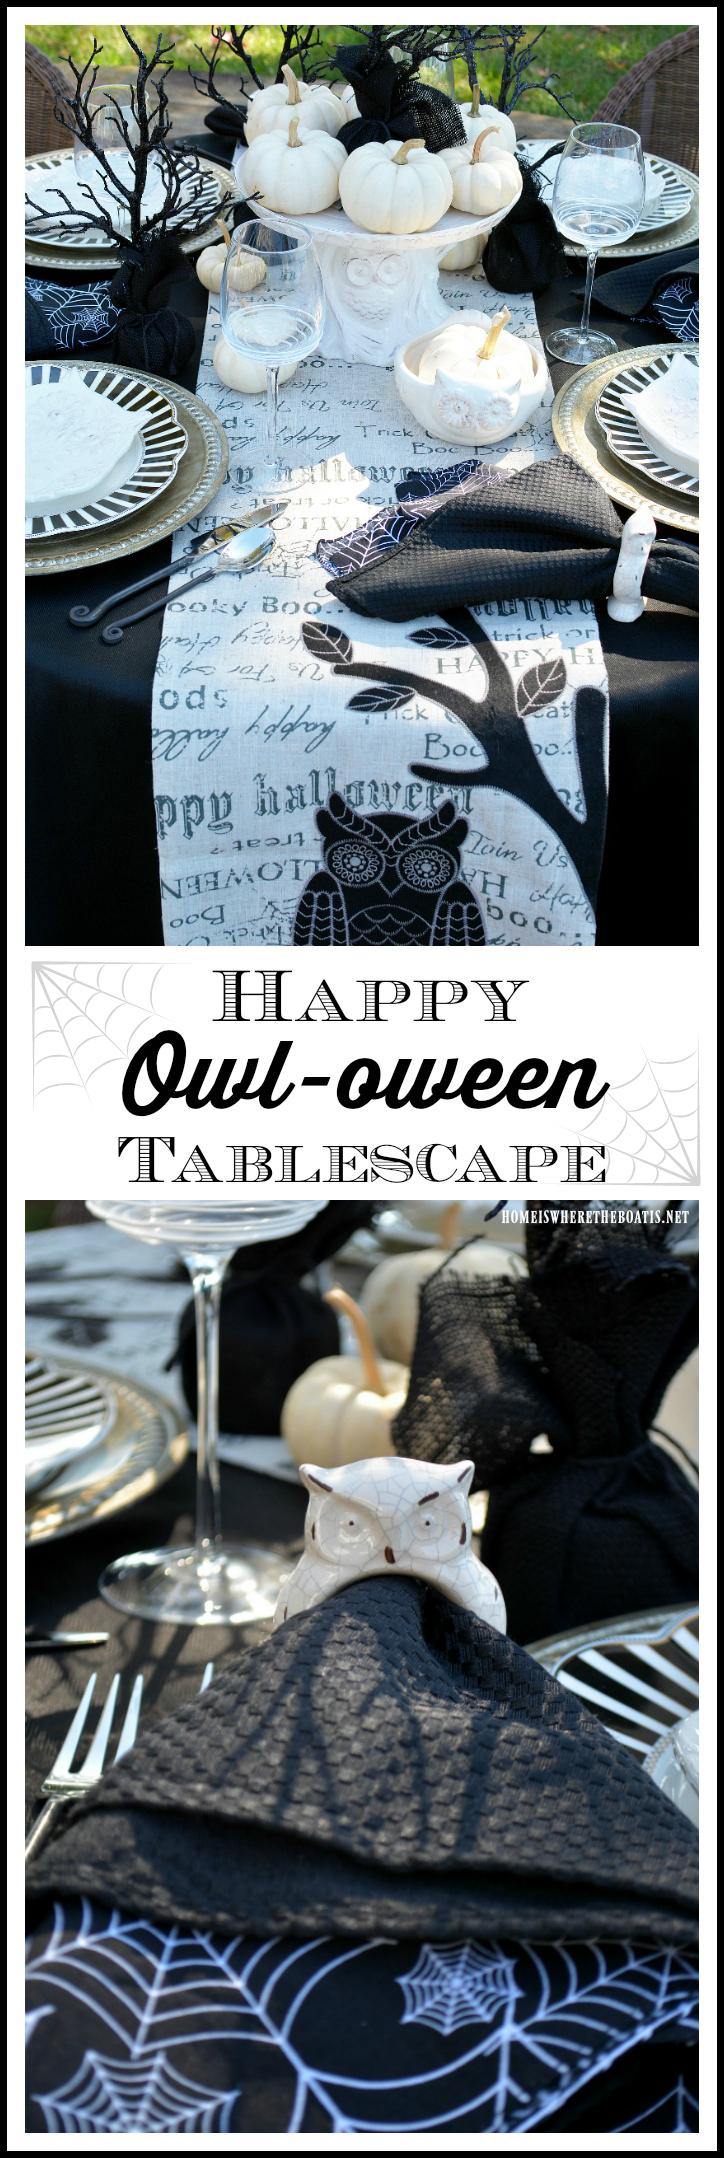 Happy Owl-oween Tablescape | homeiswheretheboatis.net #Halloween #tablescape #owls